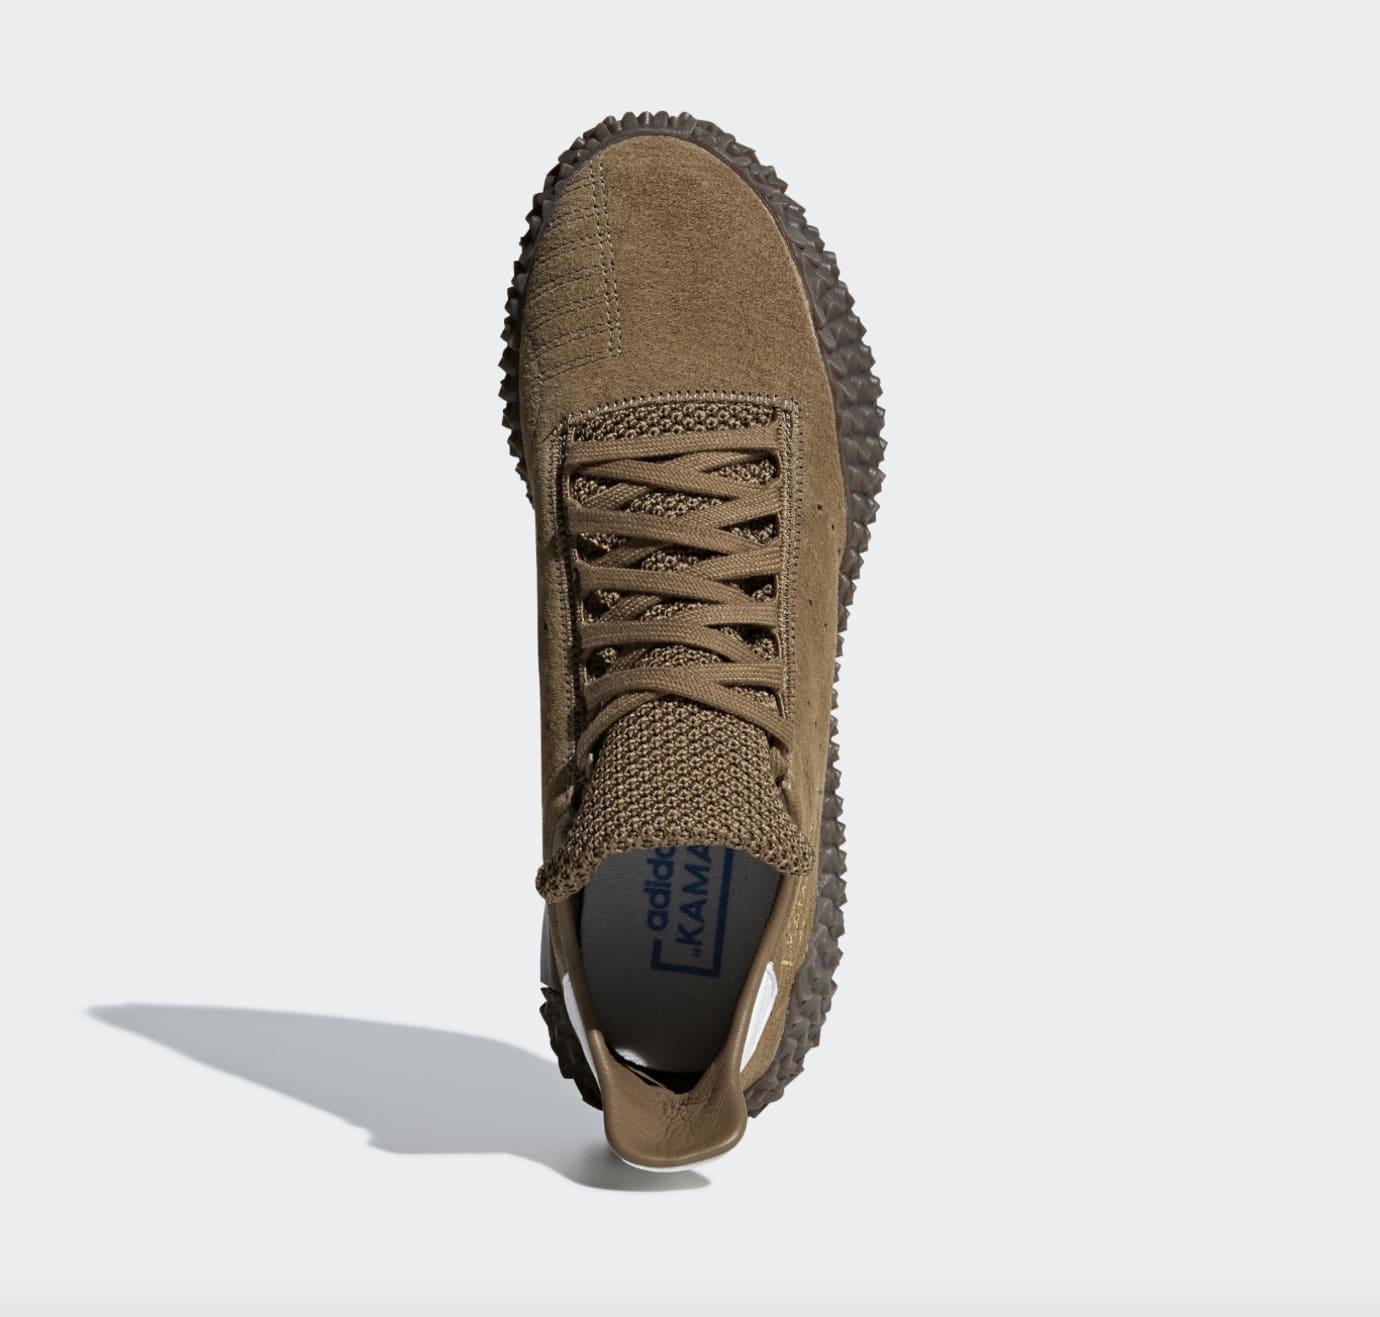 Adidas Kamanda 01 'Brown/Raw Desert/Crystal White' (Top)